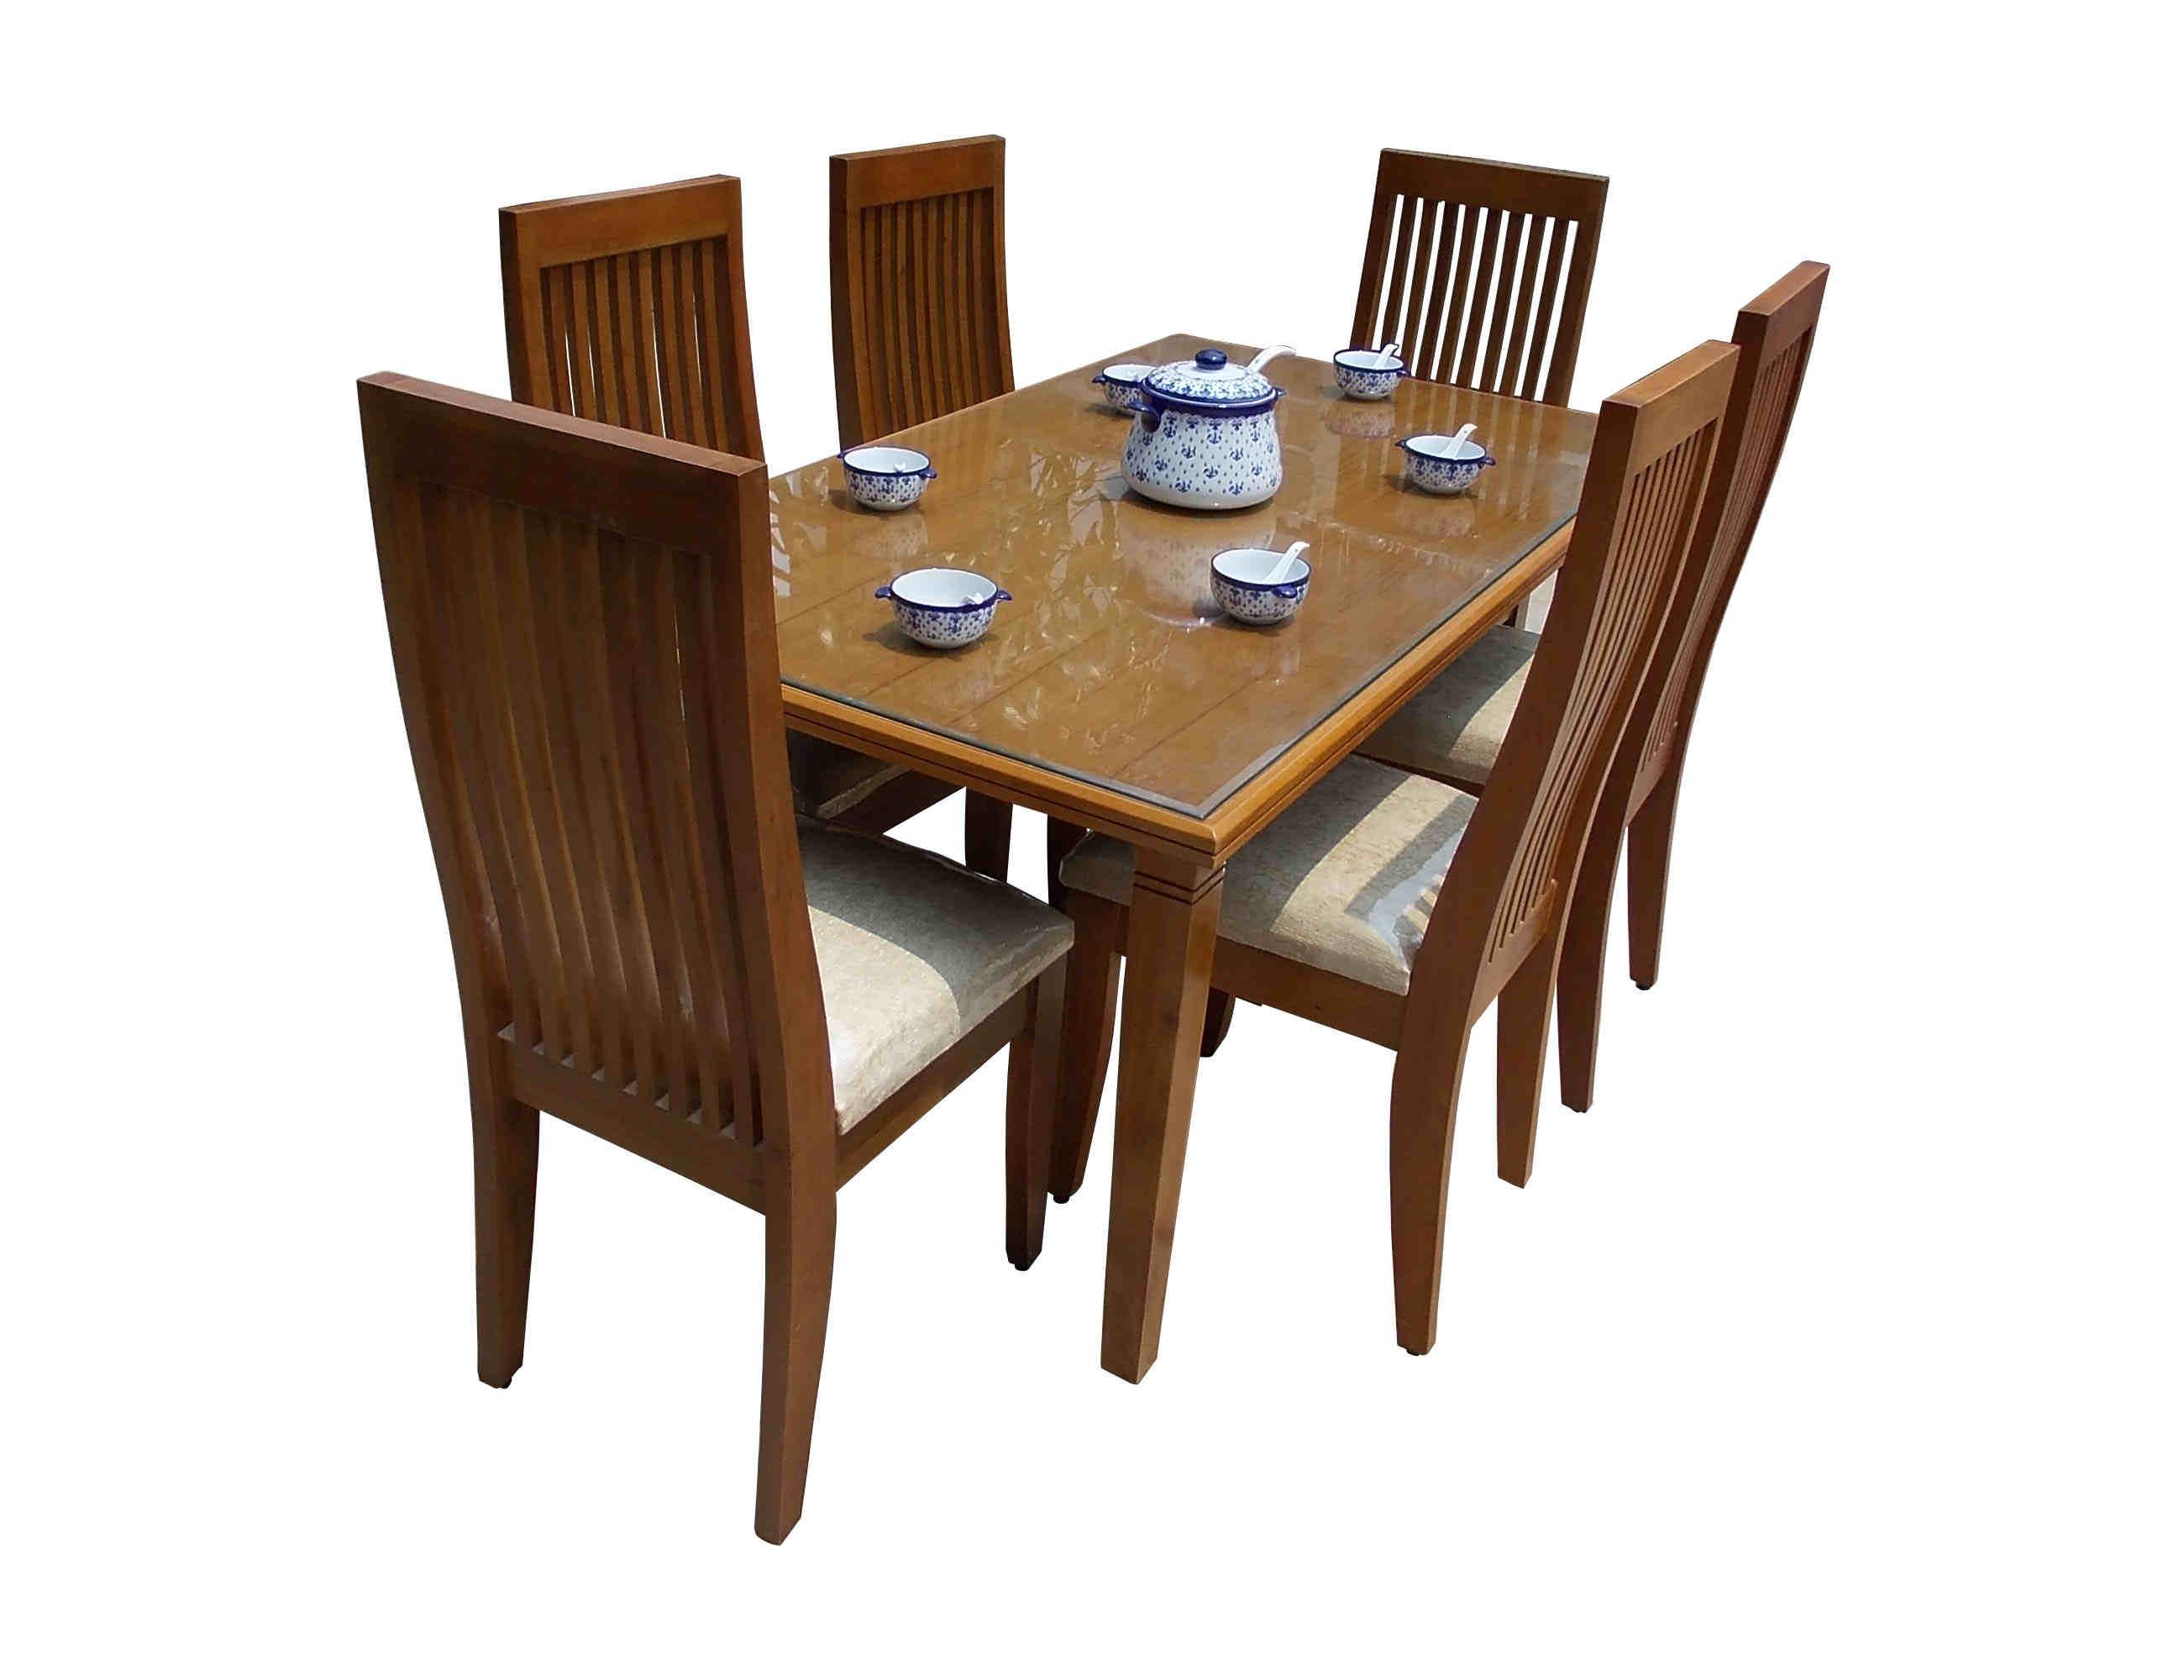 Meja Foyer Minimalis : Meja makan minimalis athena kursi jayafurni mebel